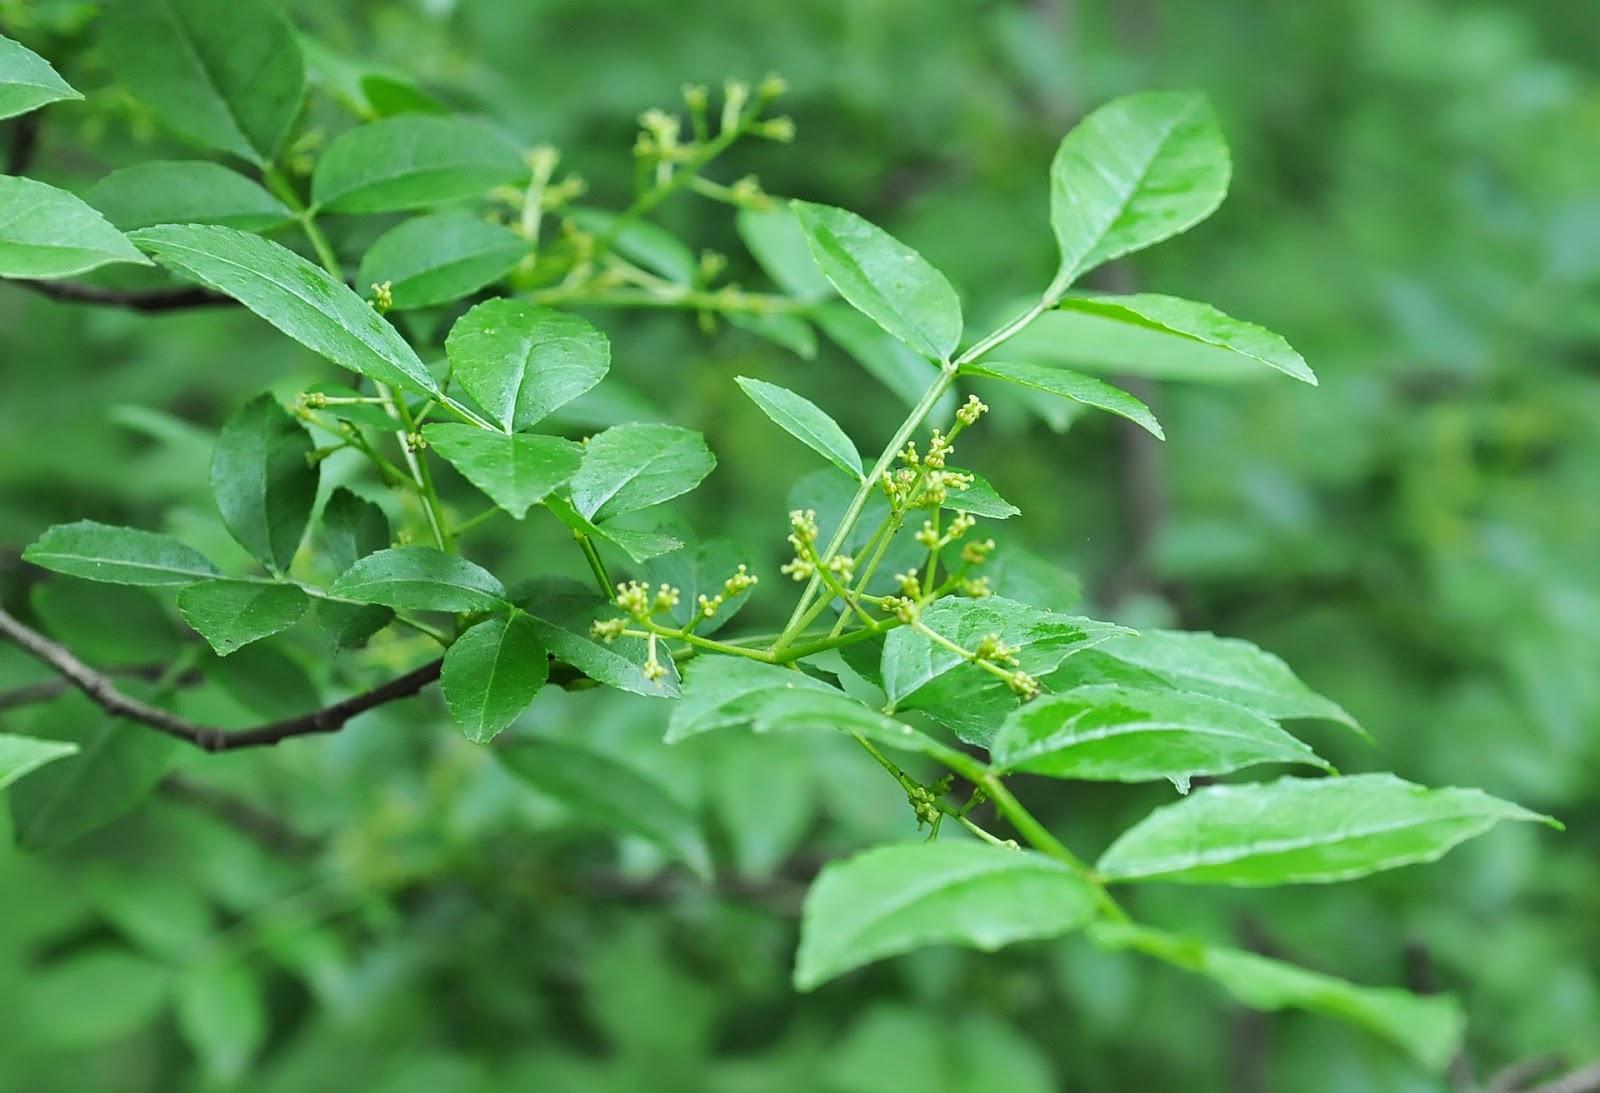 Benefits Of Prickly Ash (Zanthoxylum Americanum) For Health